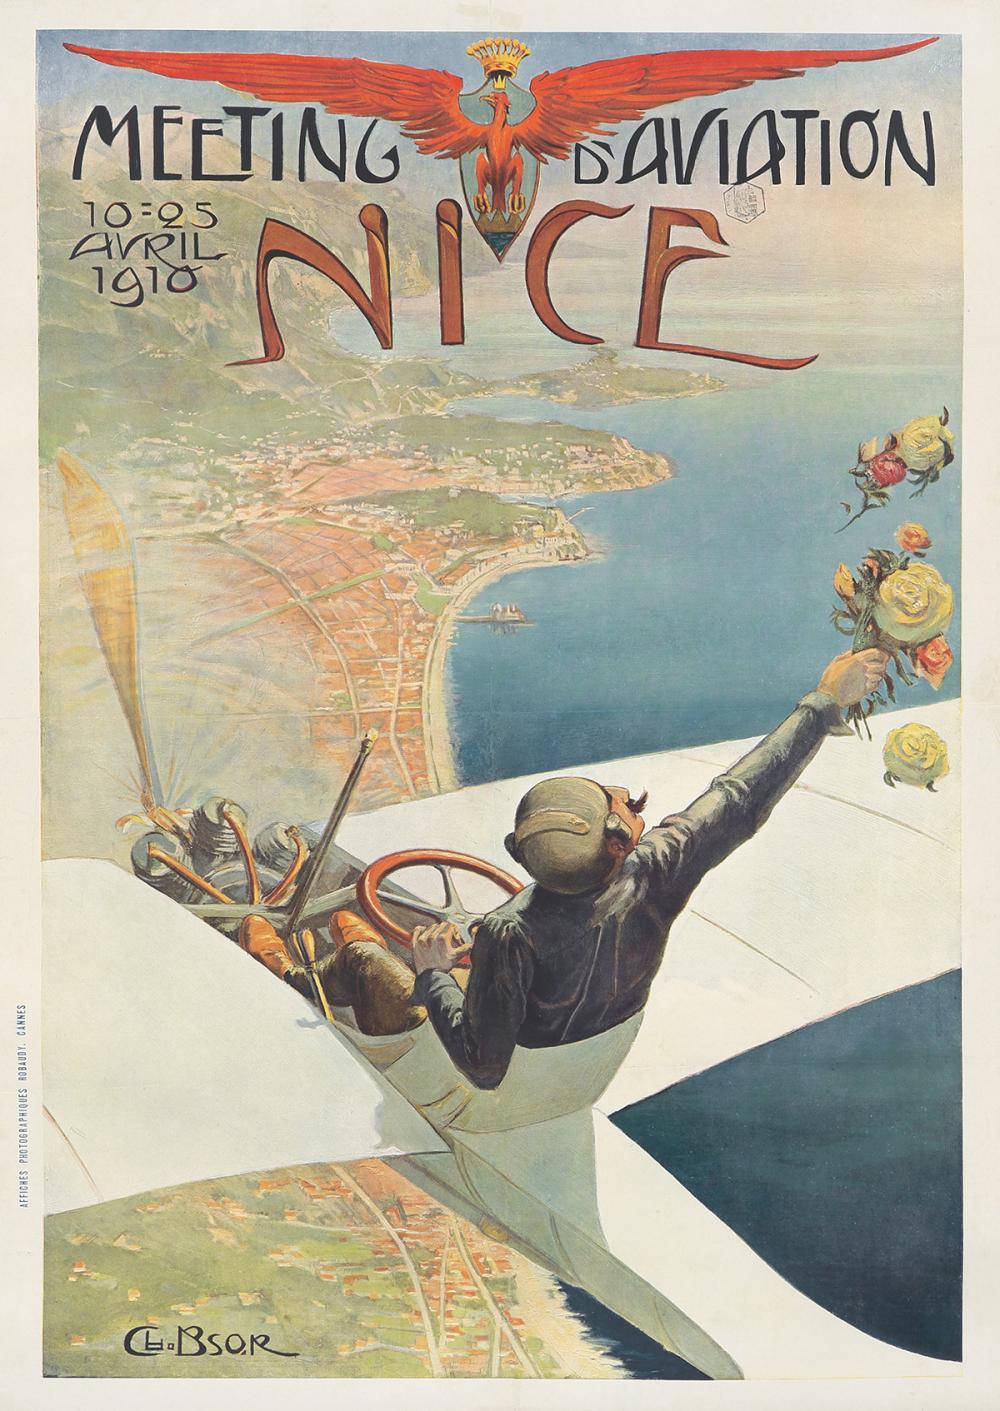 Meeting d'Aviation / Nice. 1910.